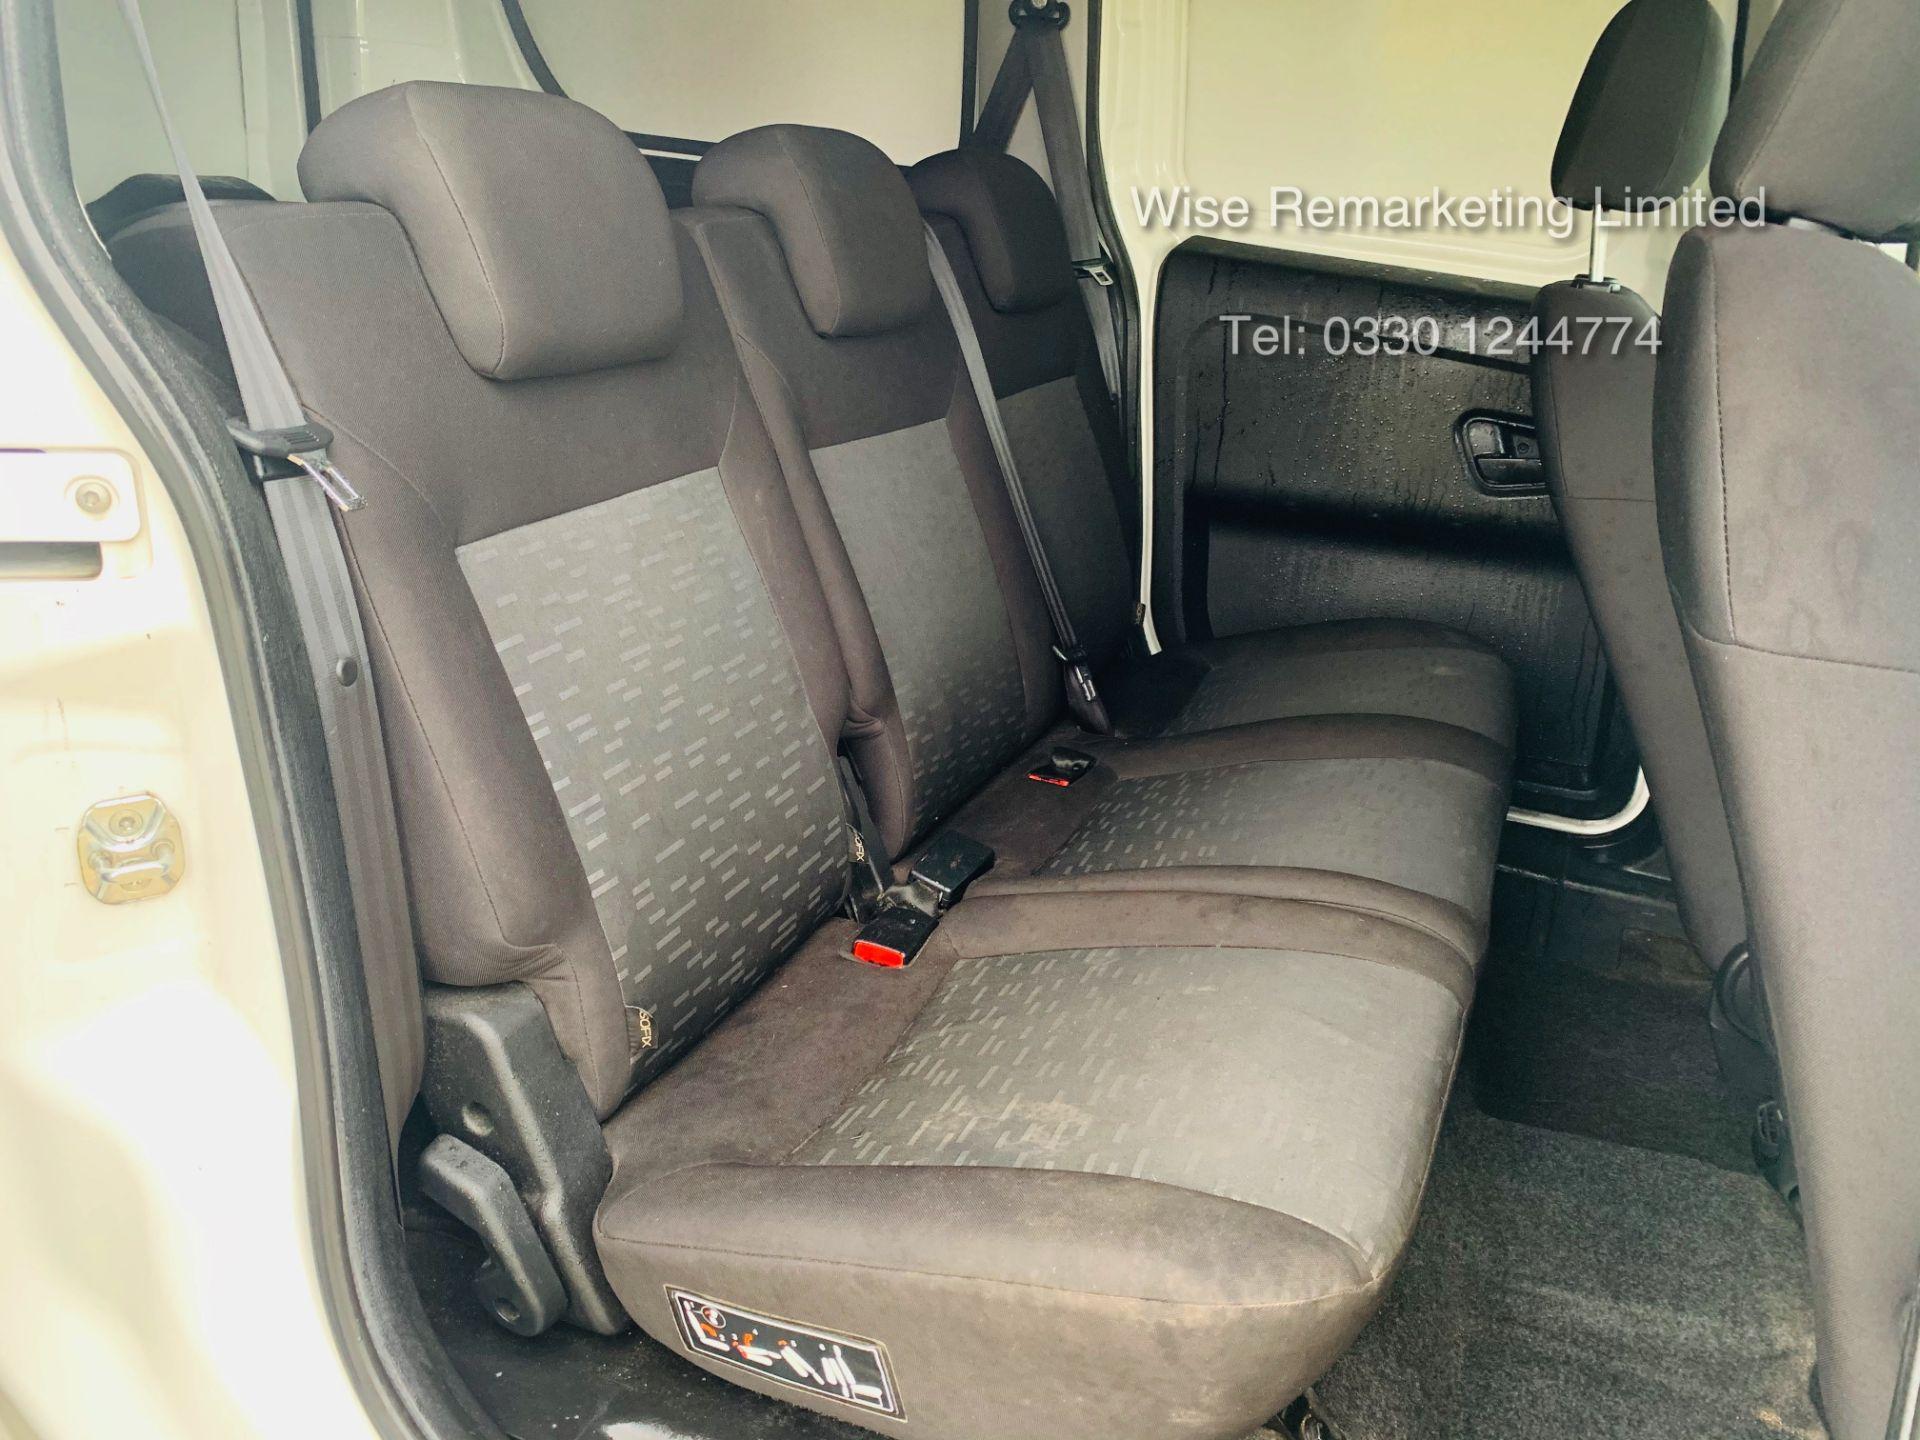 Lot 11a - (RESERVE MET)Vauxhall Combo 1.6 CDTI Eco LWB Maxi 6 Speed 5 Seater Combi/Dualliner Van - 2014 14 Reg